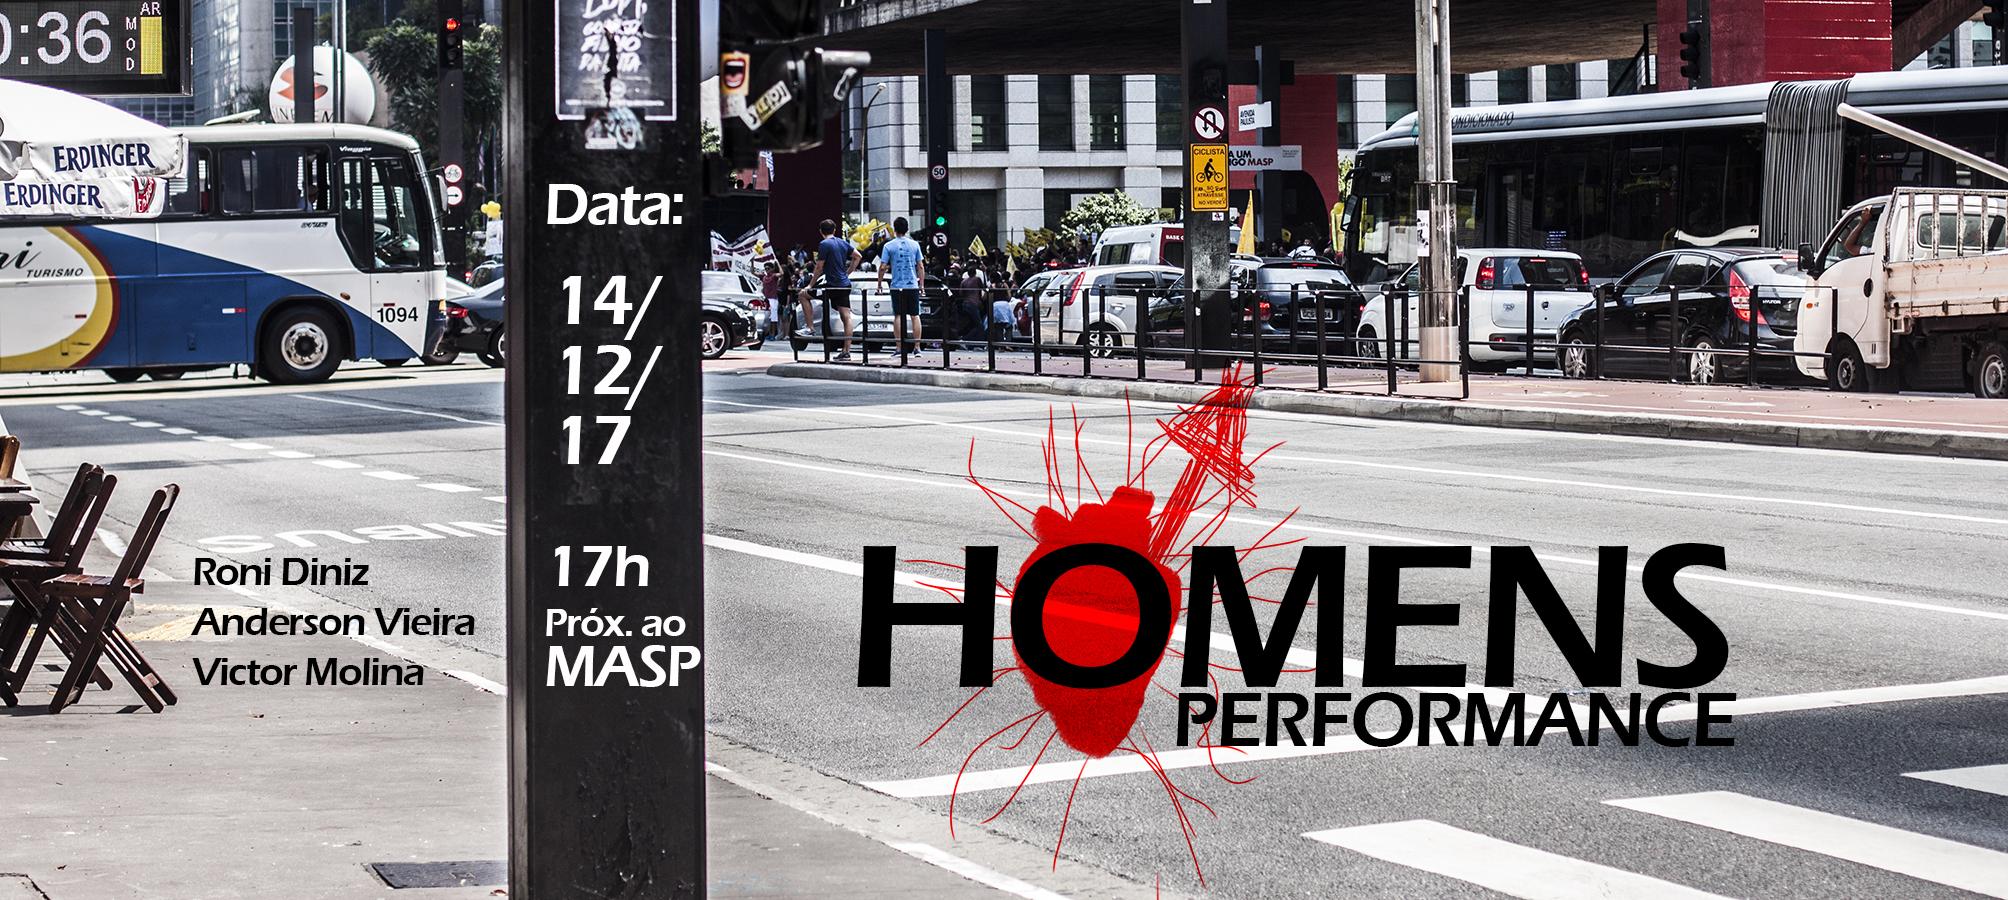 Performance Homens 14/12/17